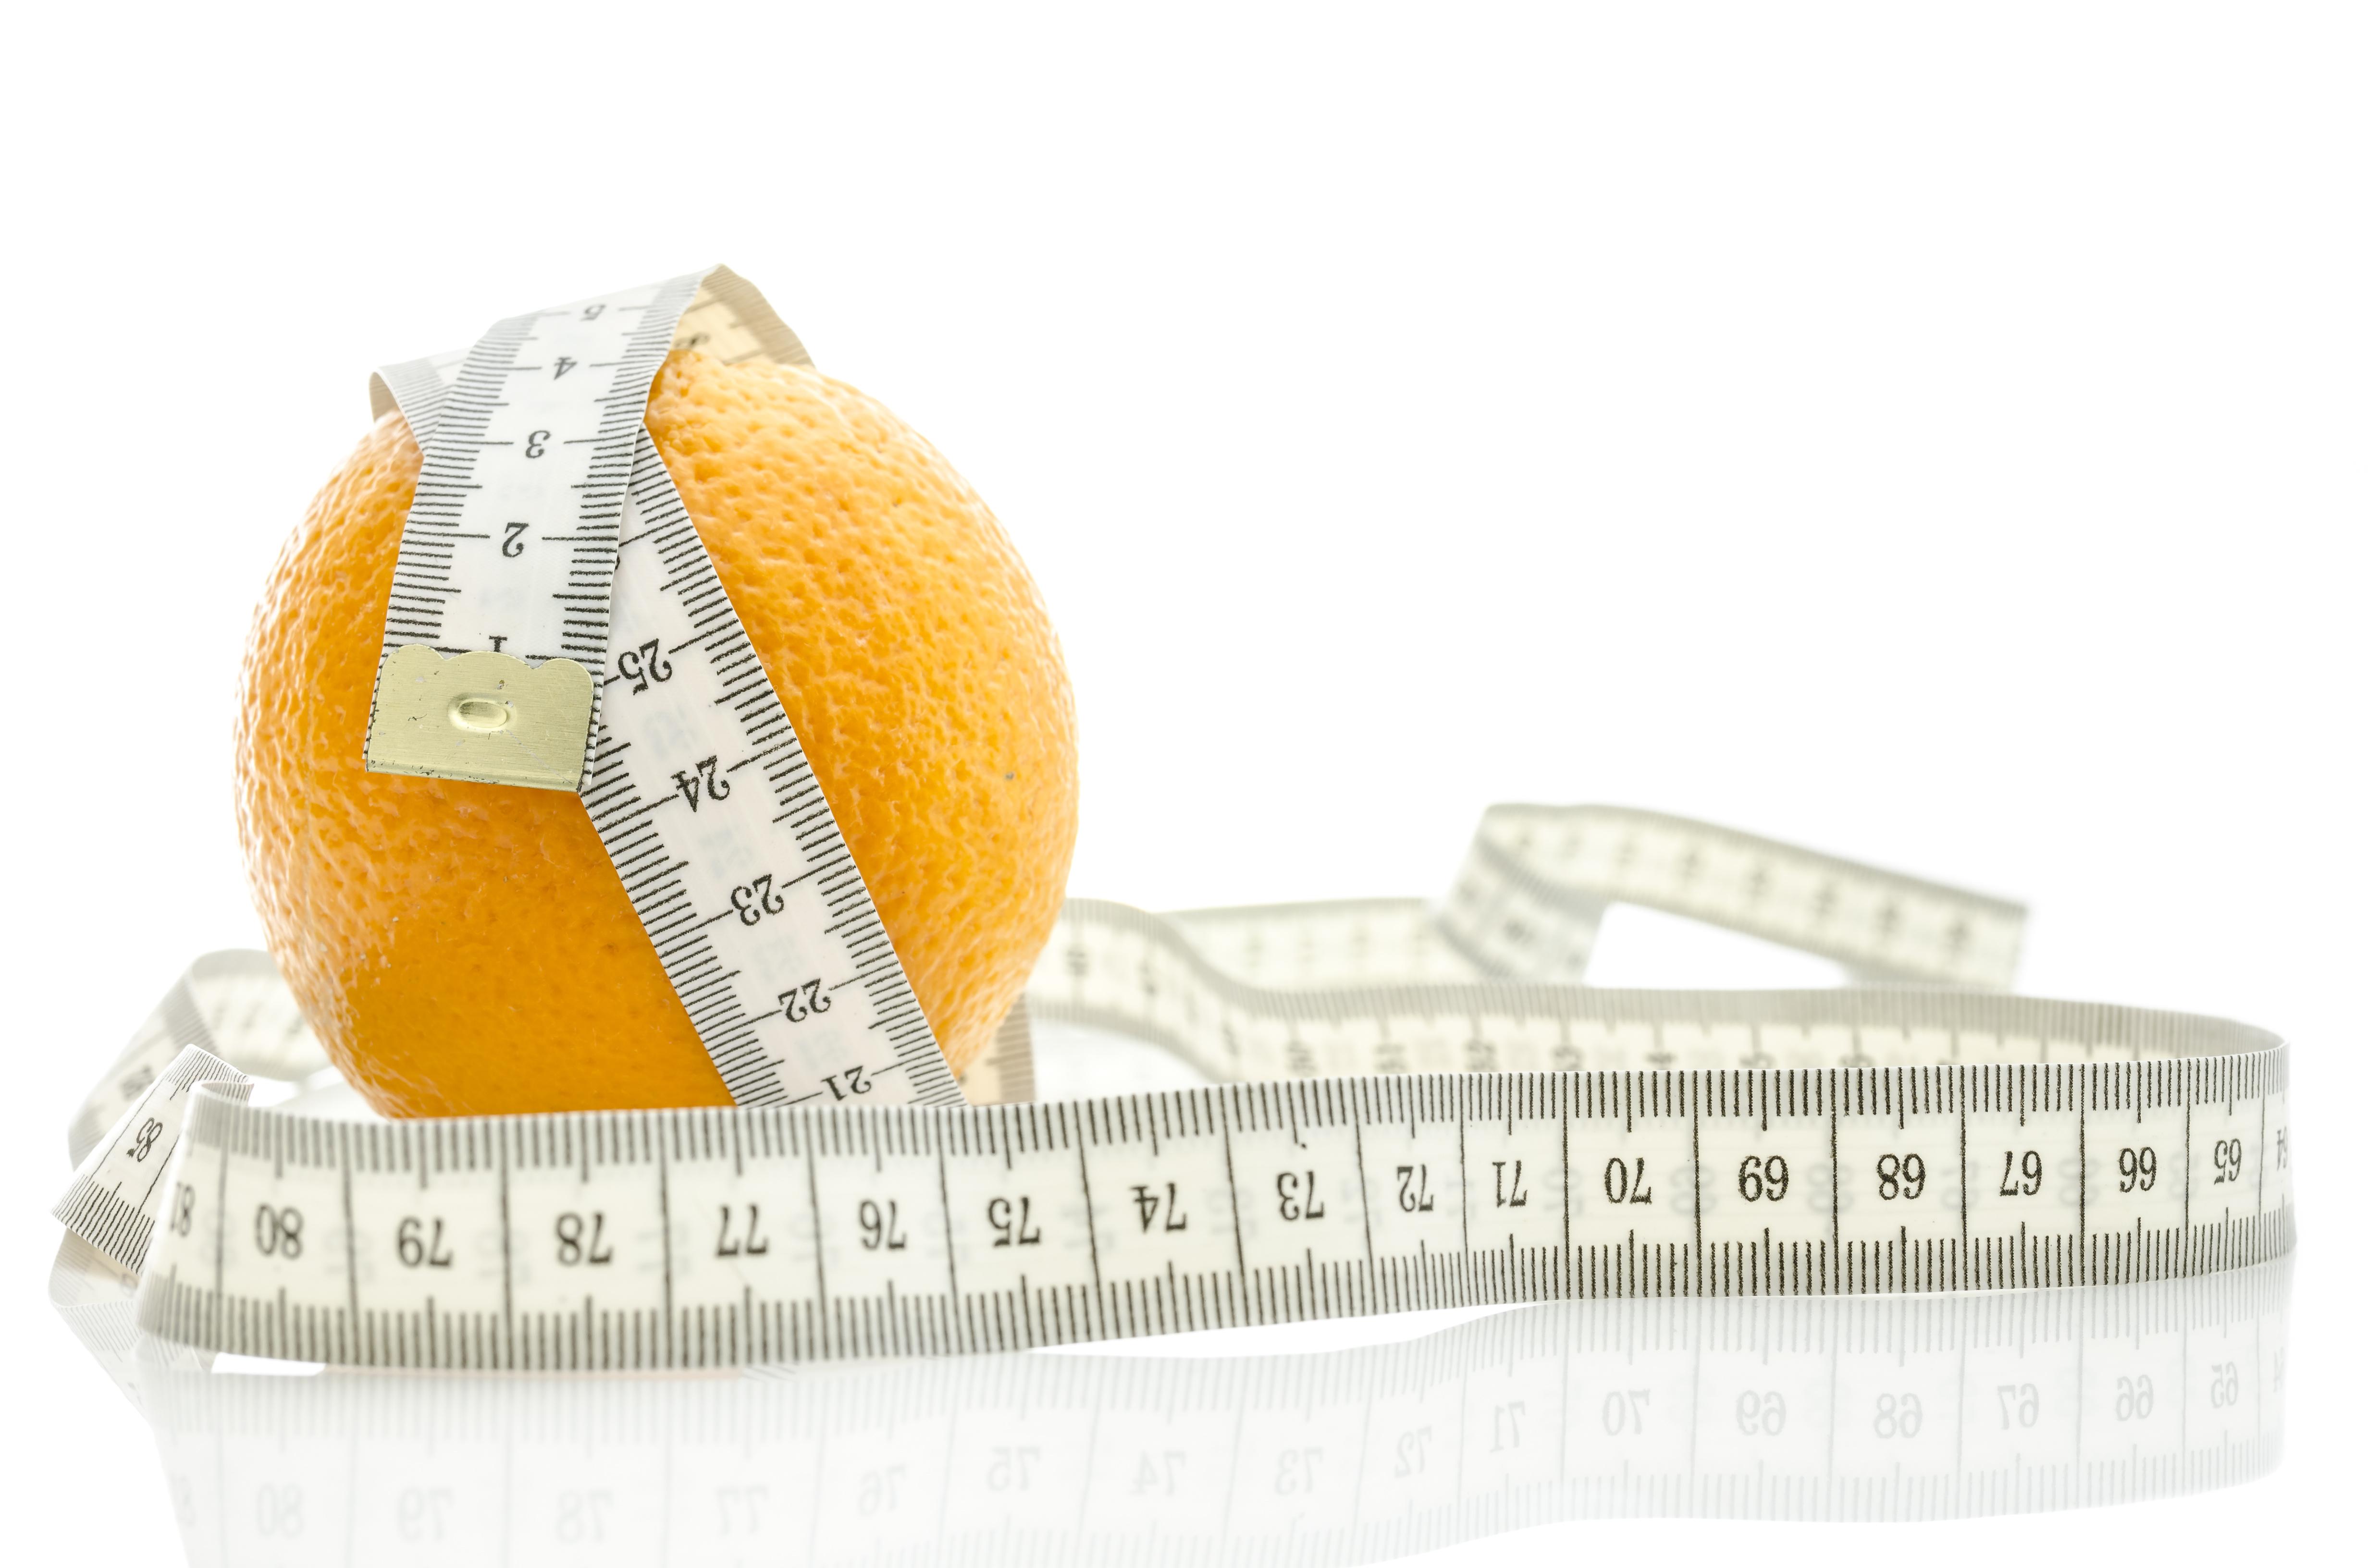 Fresh orange with measuring tape